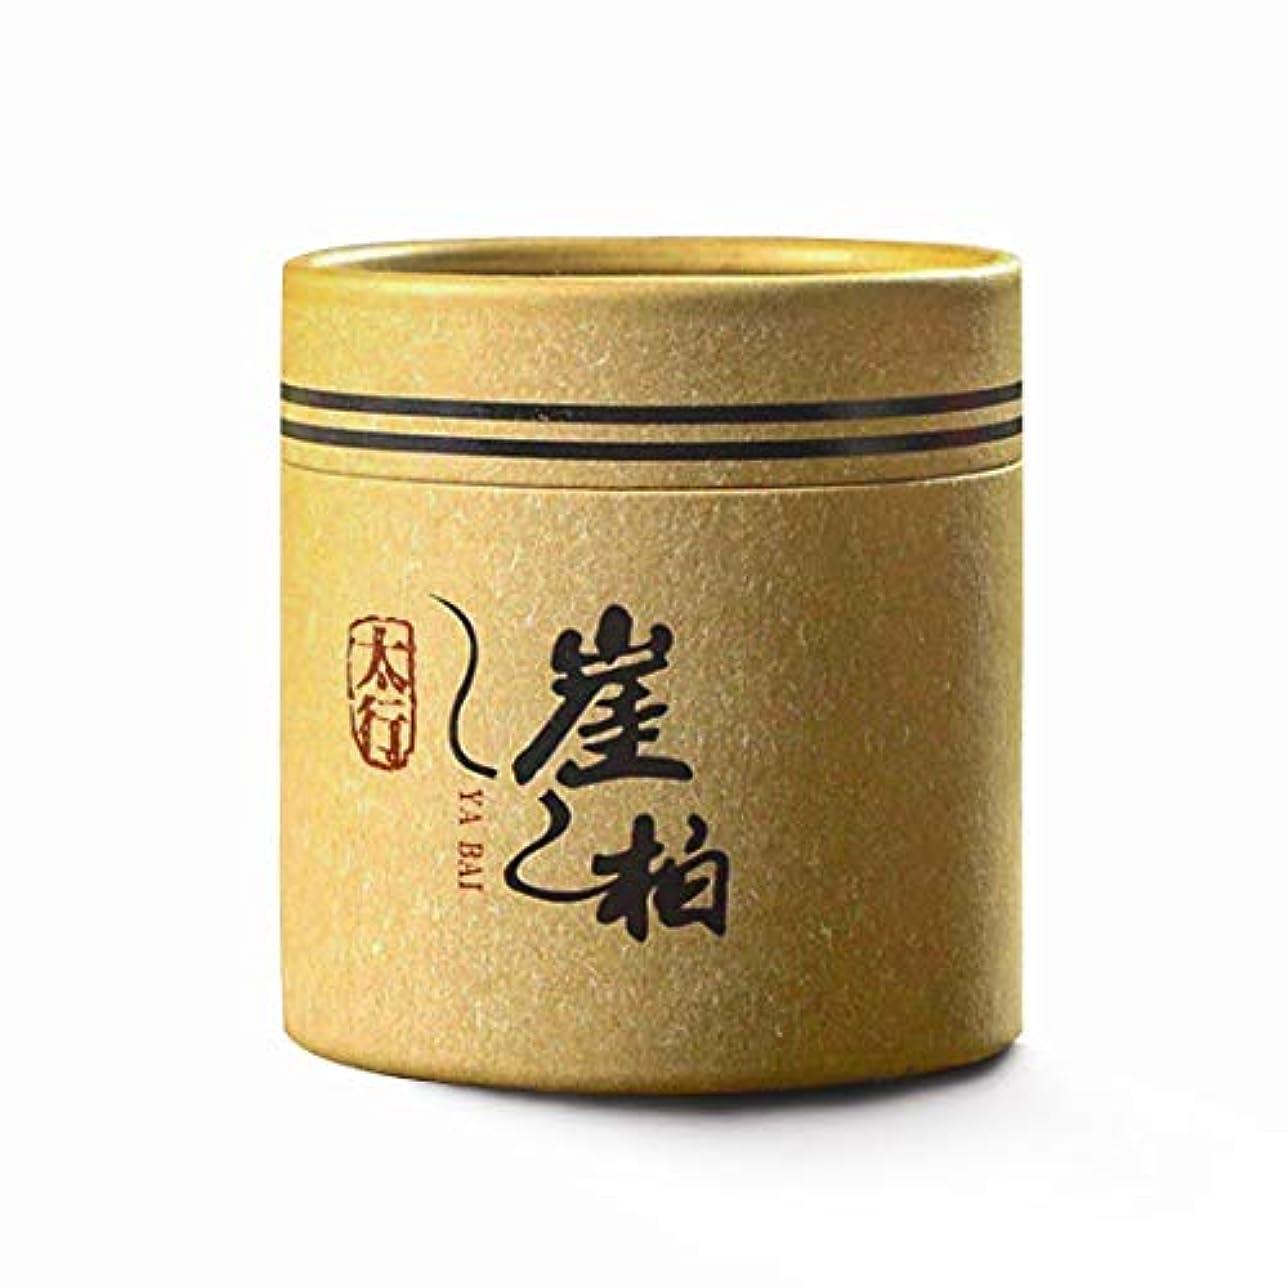 Hwagui お香 陈化崖柏 優しい香り 渦巻き線香 4時間盤香 48巻入